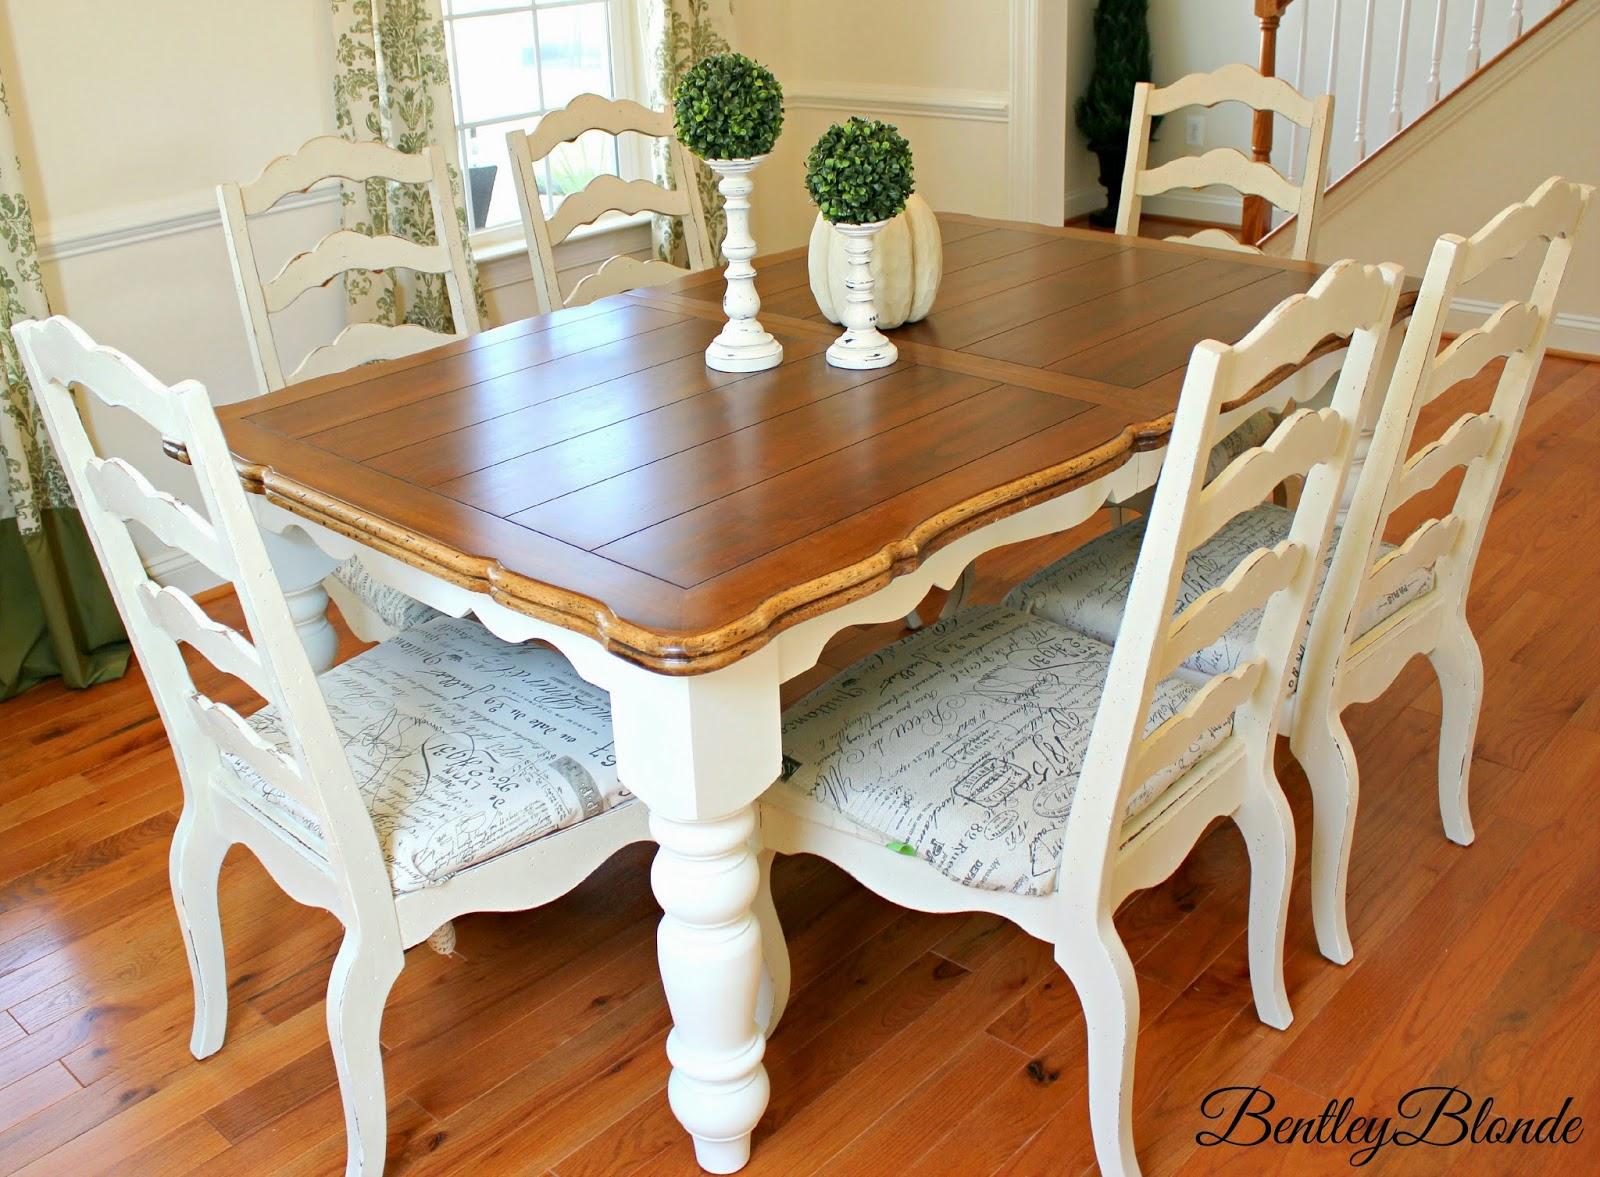 BentleyBlonde: DIY Farmhouse Table & Dining Set Makeover ...